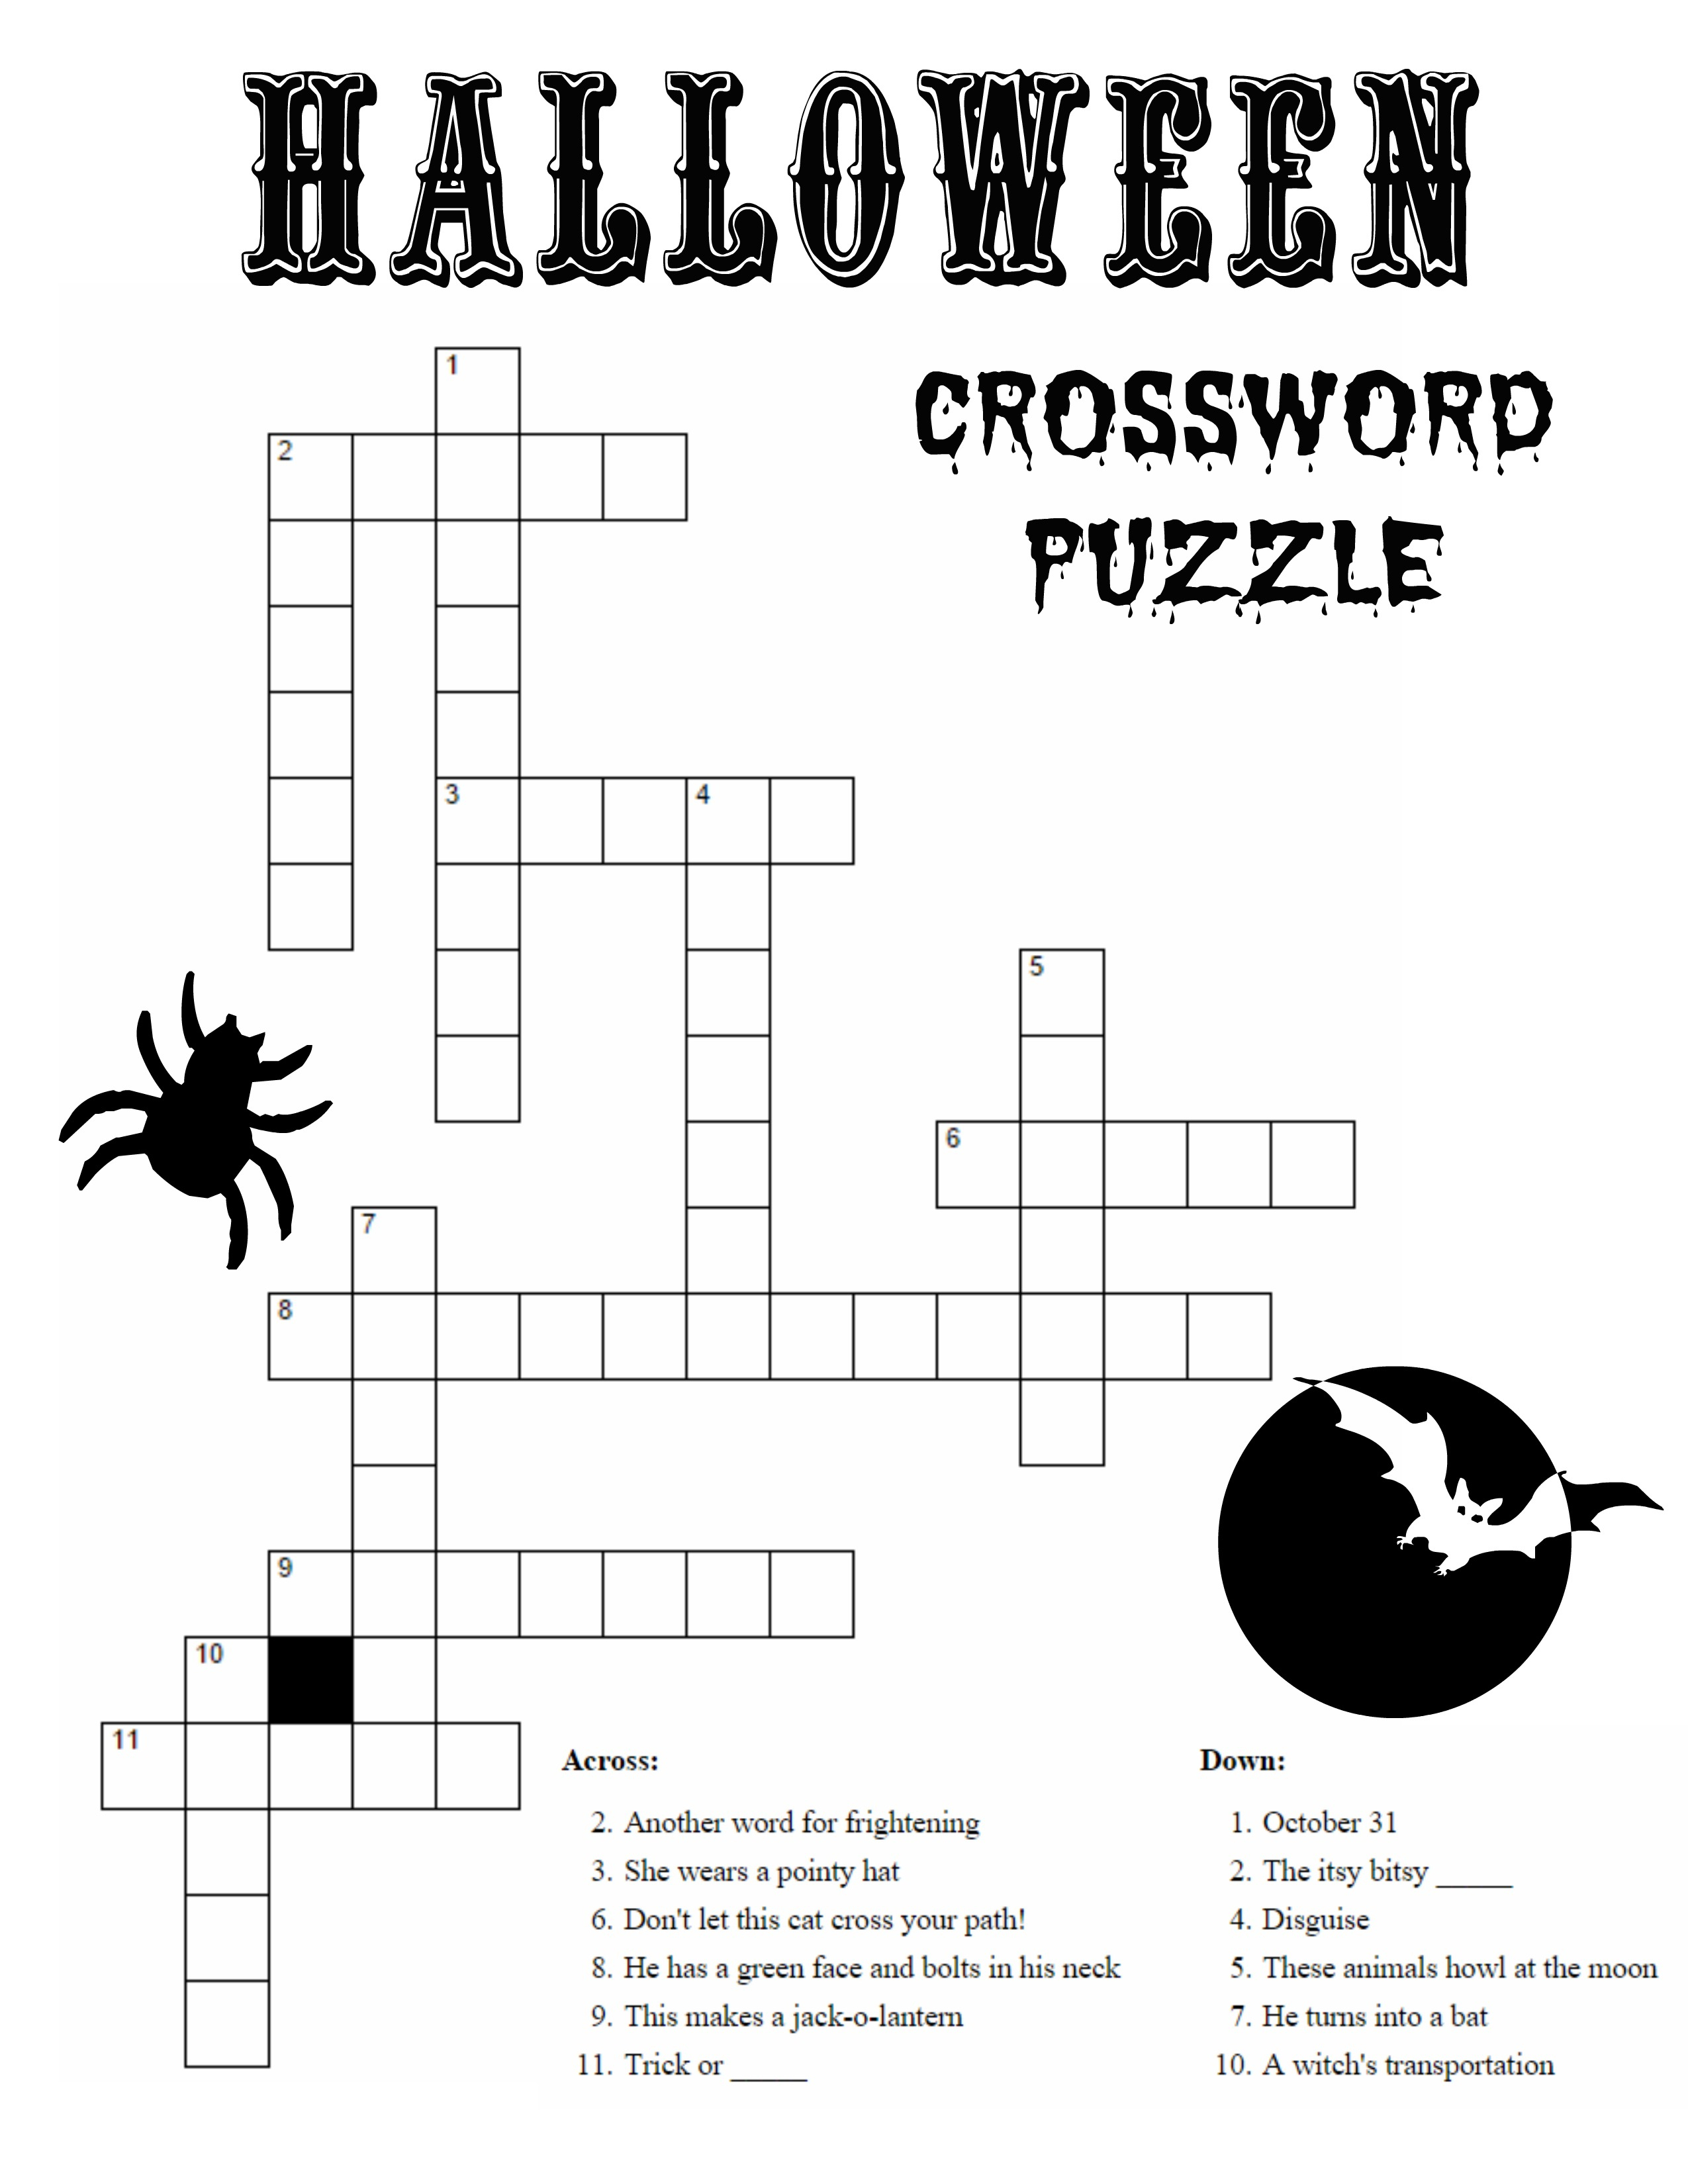 10 Best Photos Of Printable Halloween Word Puzzles - Halloween Word - Halloween Crossword Puzzles For Adults Printable